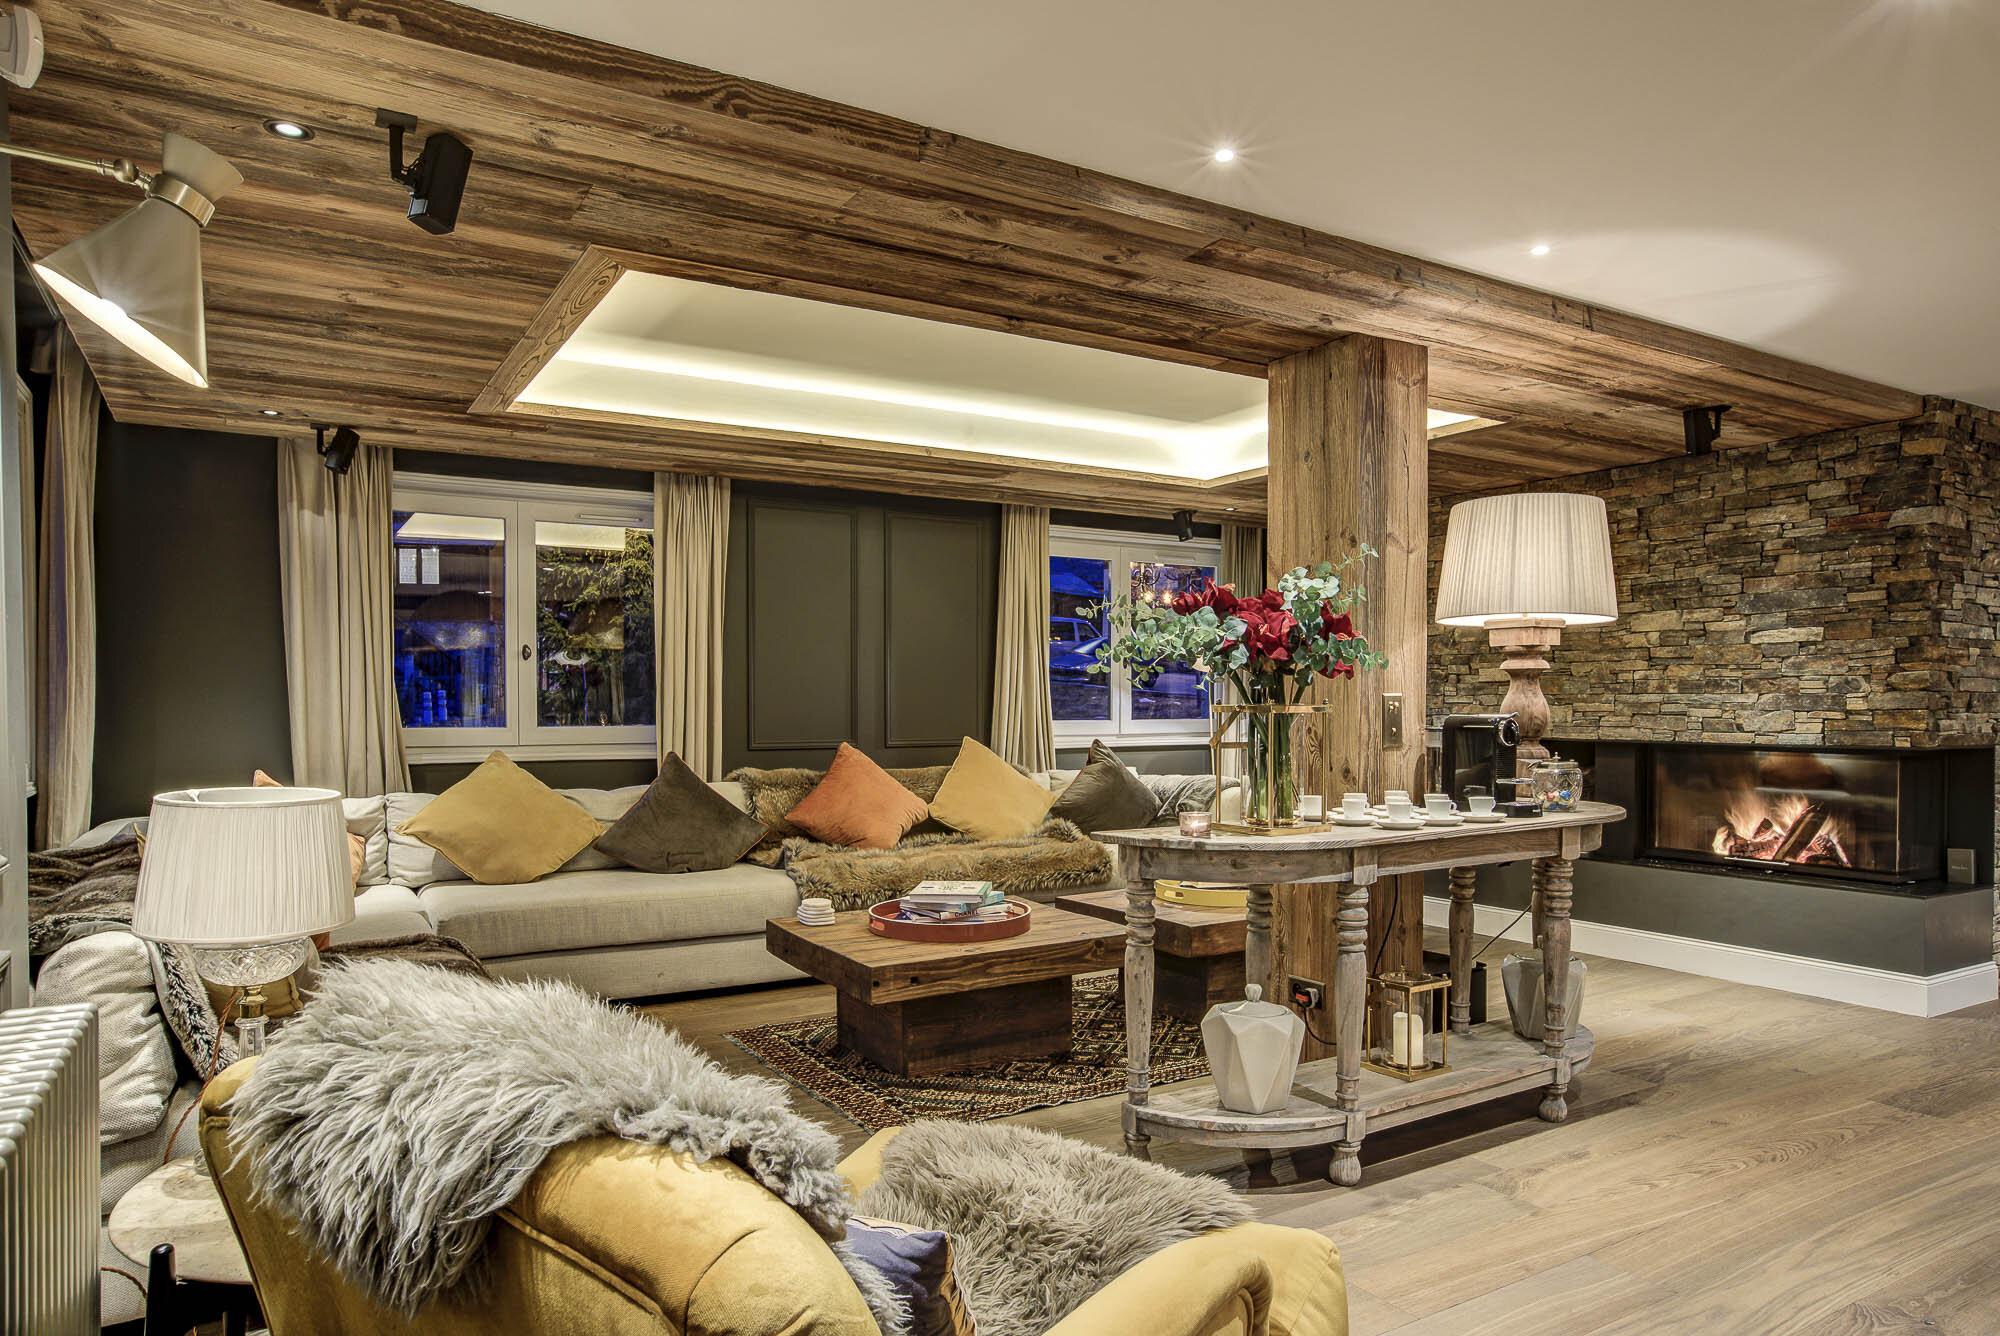 tg-ski-luxury-chalet-lightbowne-meribel-009